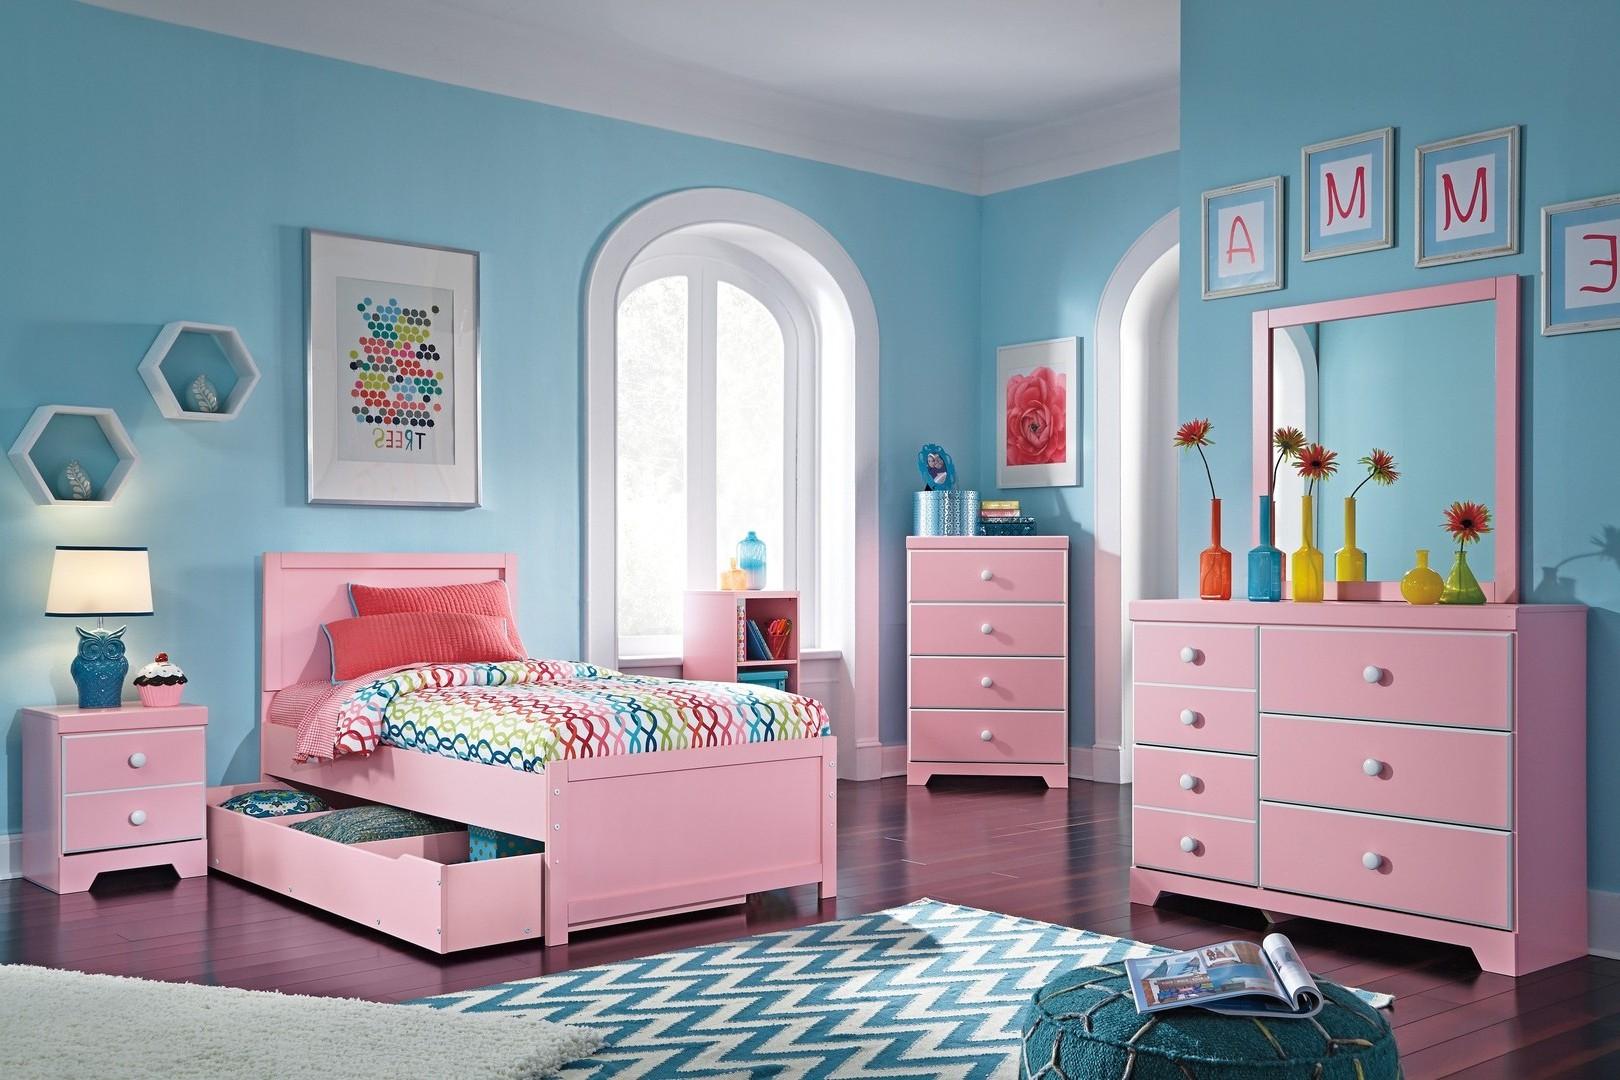 kamar tidur anak nuansa pink | sobat interior rumah